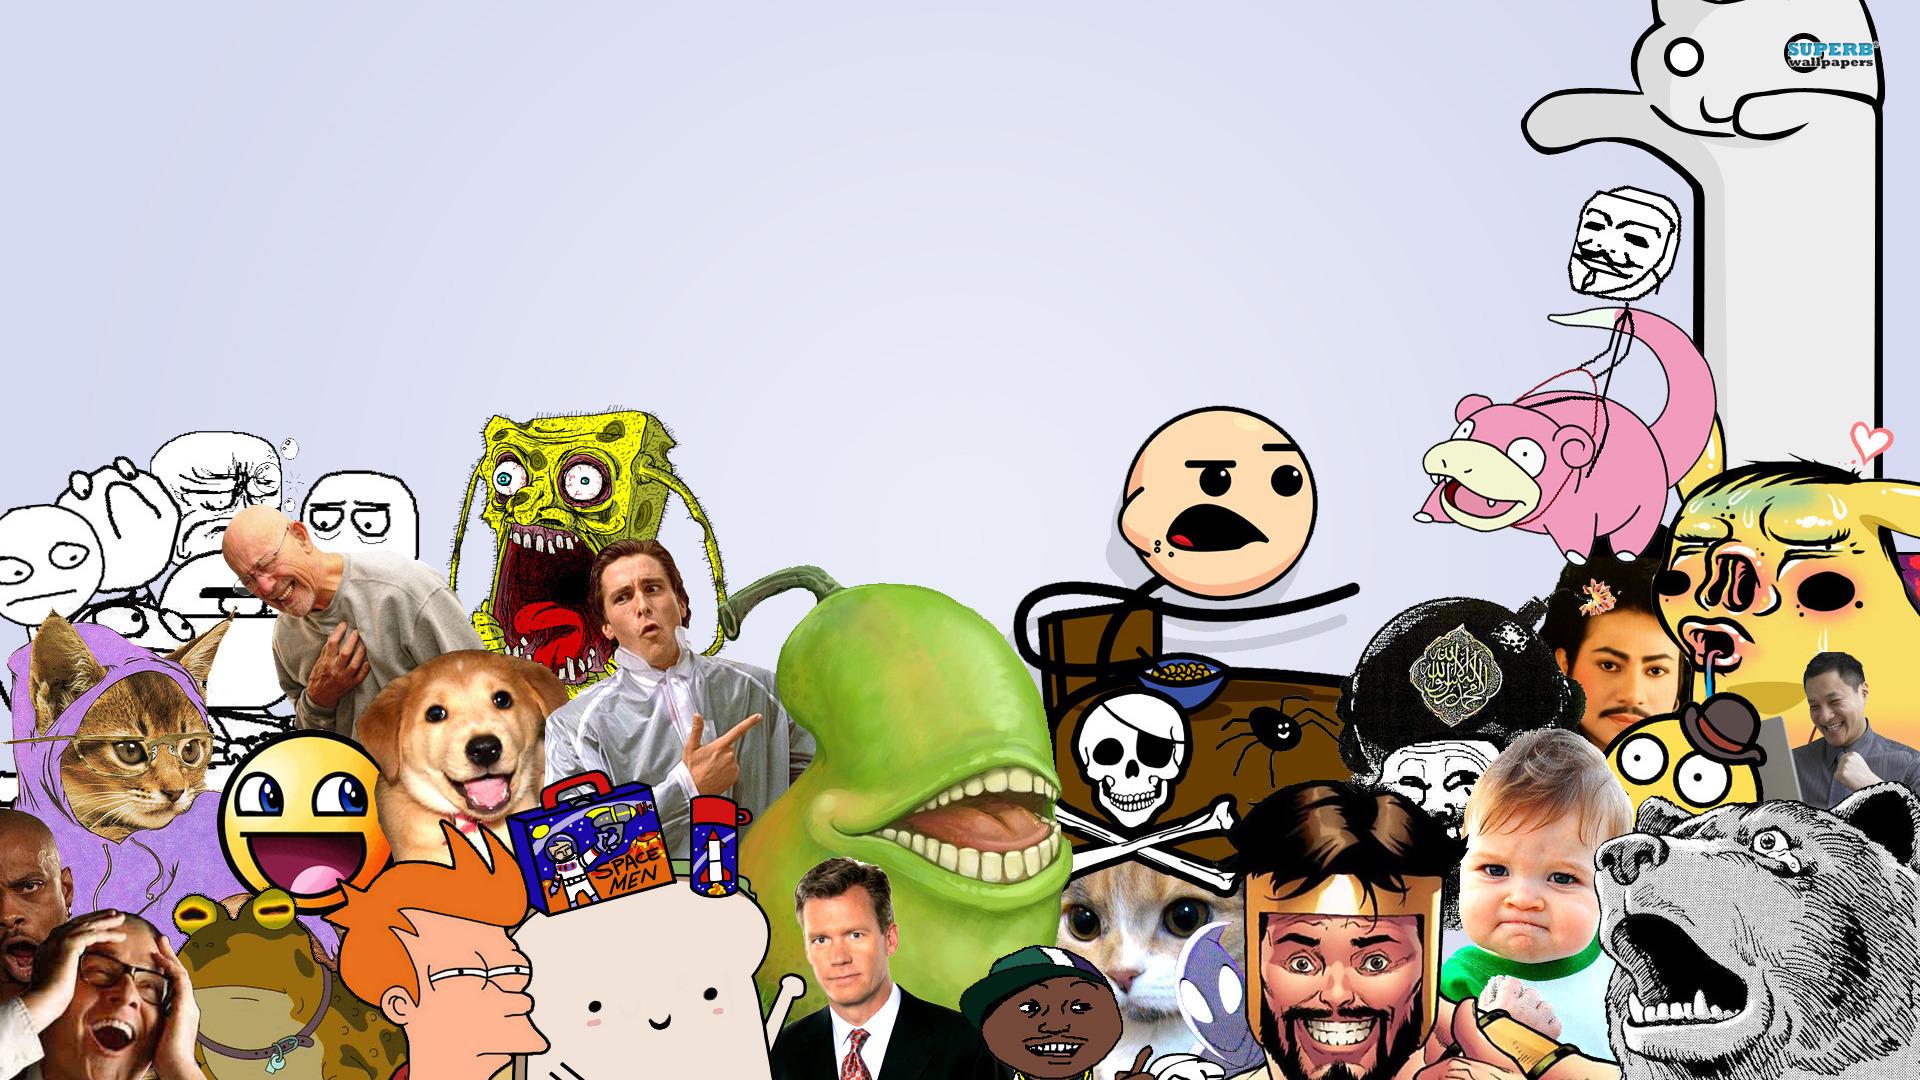 Meme Wallpaper   Memes Wallpaper 30218798 1920x1080